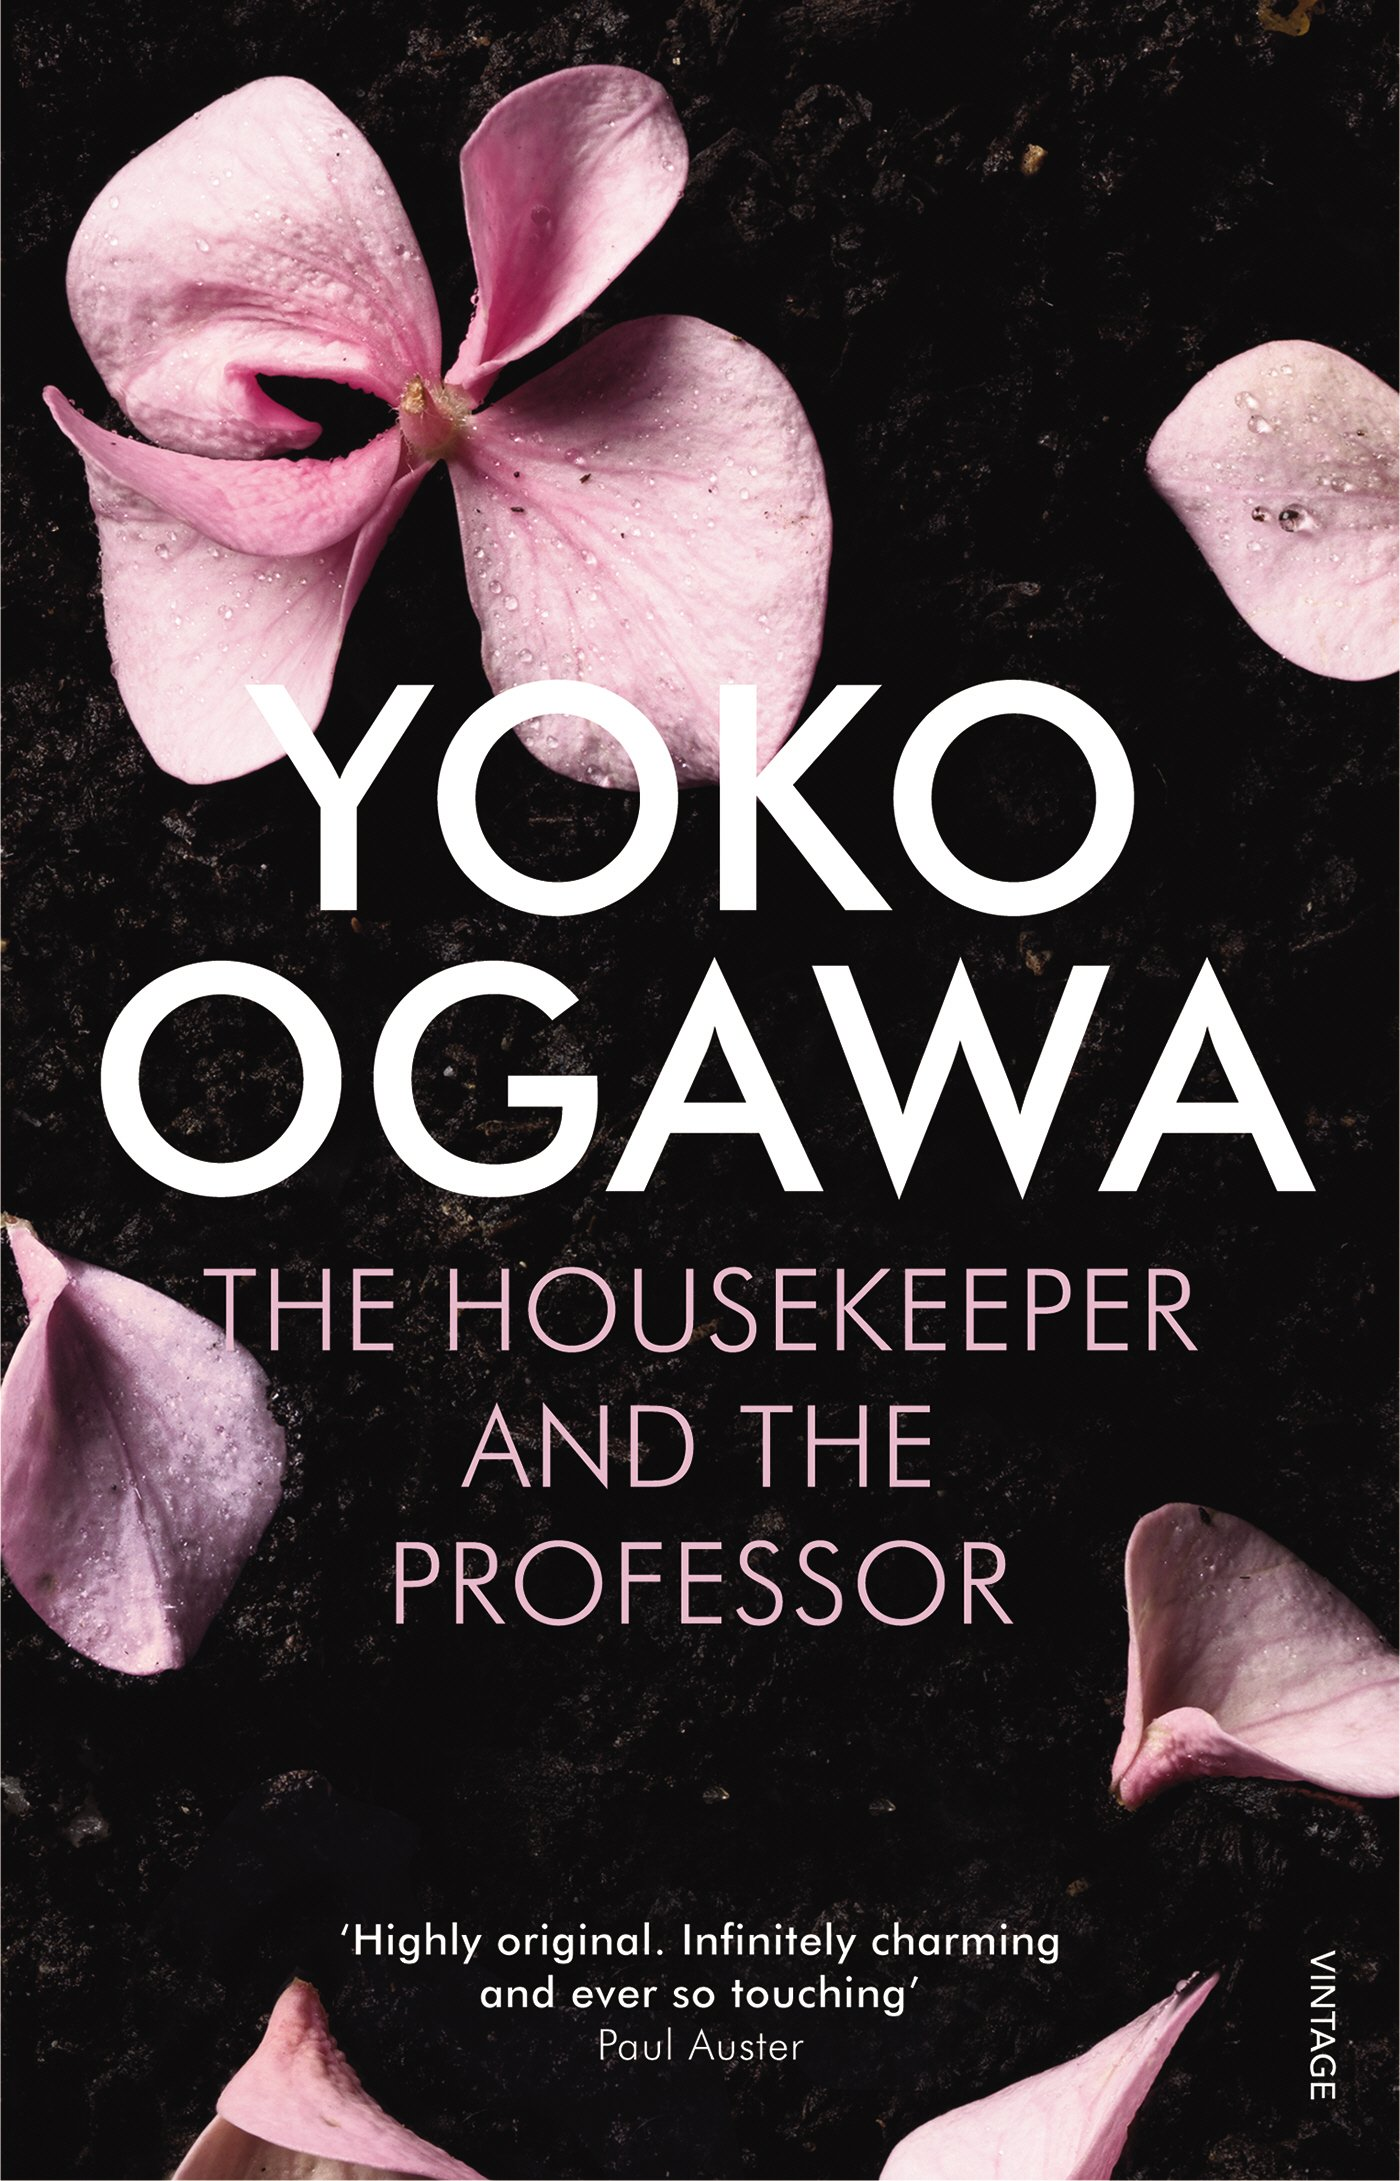 The Housekeeper and the Professor: Amazon.co.uk: Ogawa, Yoko, Snyder,  Stephen: 9780099521341: Books